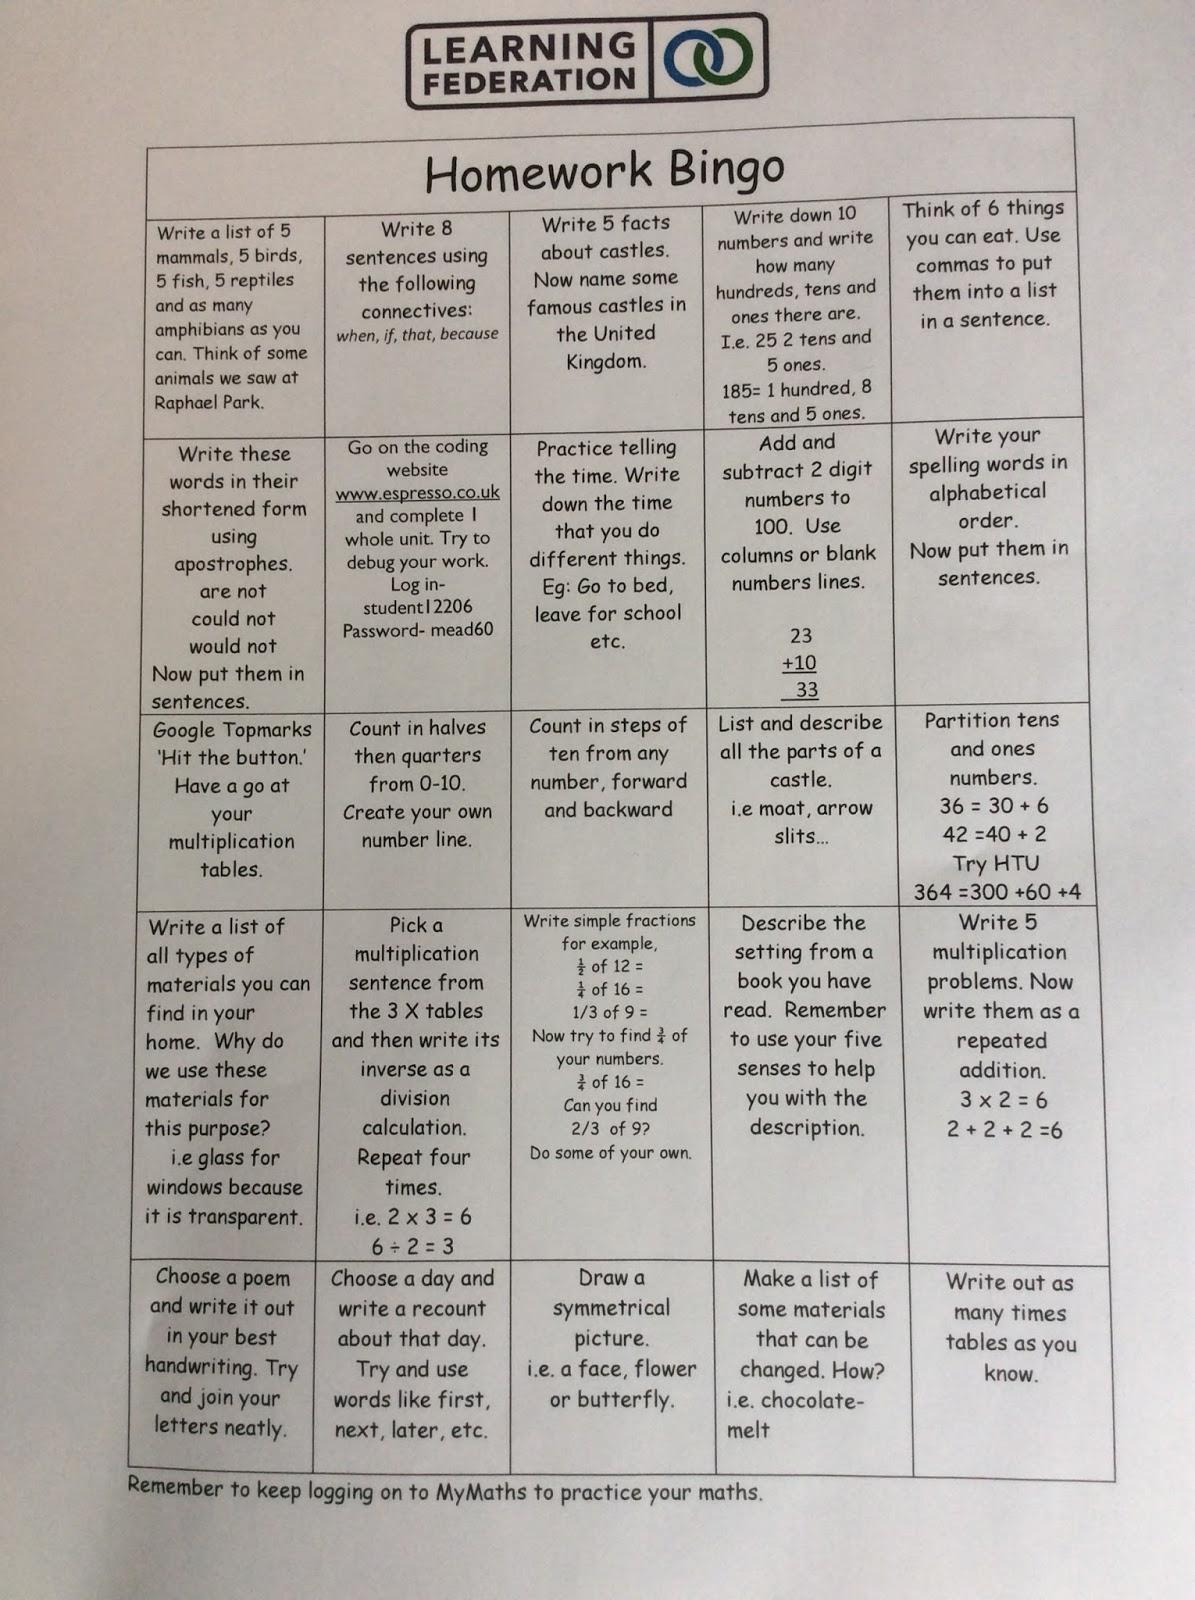 a scholarship essay sample be formatting